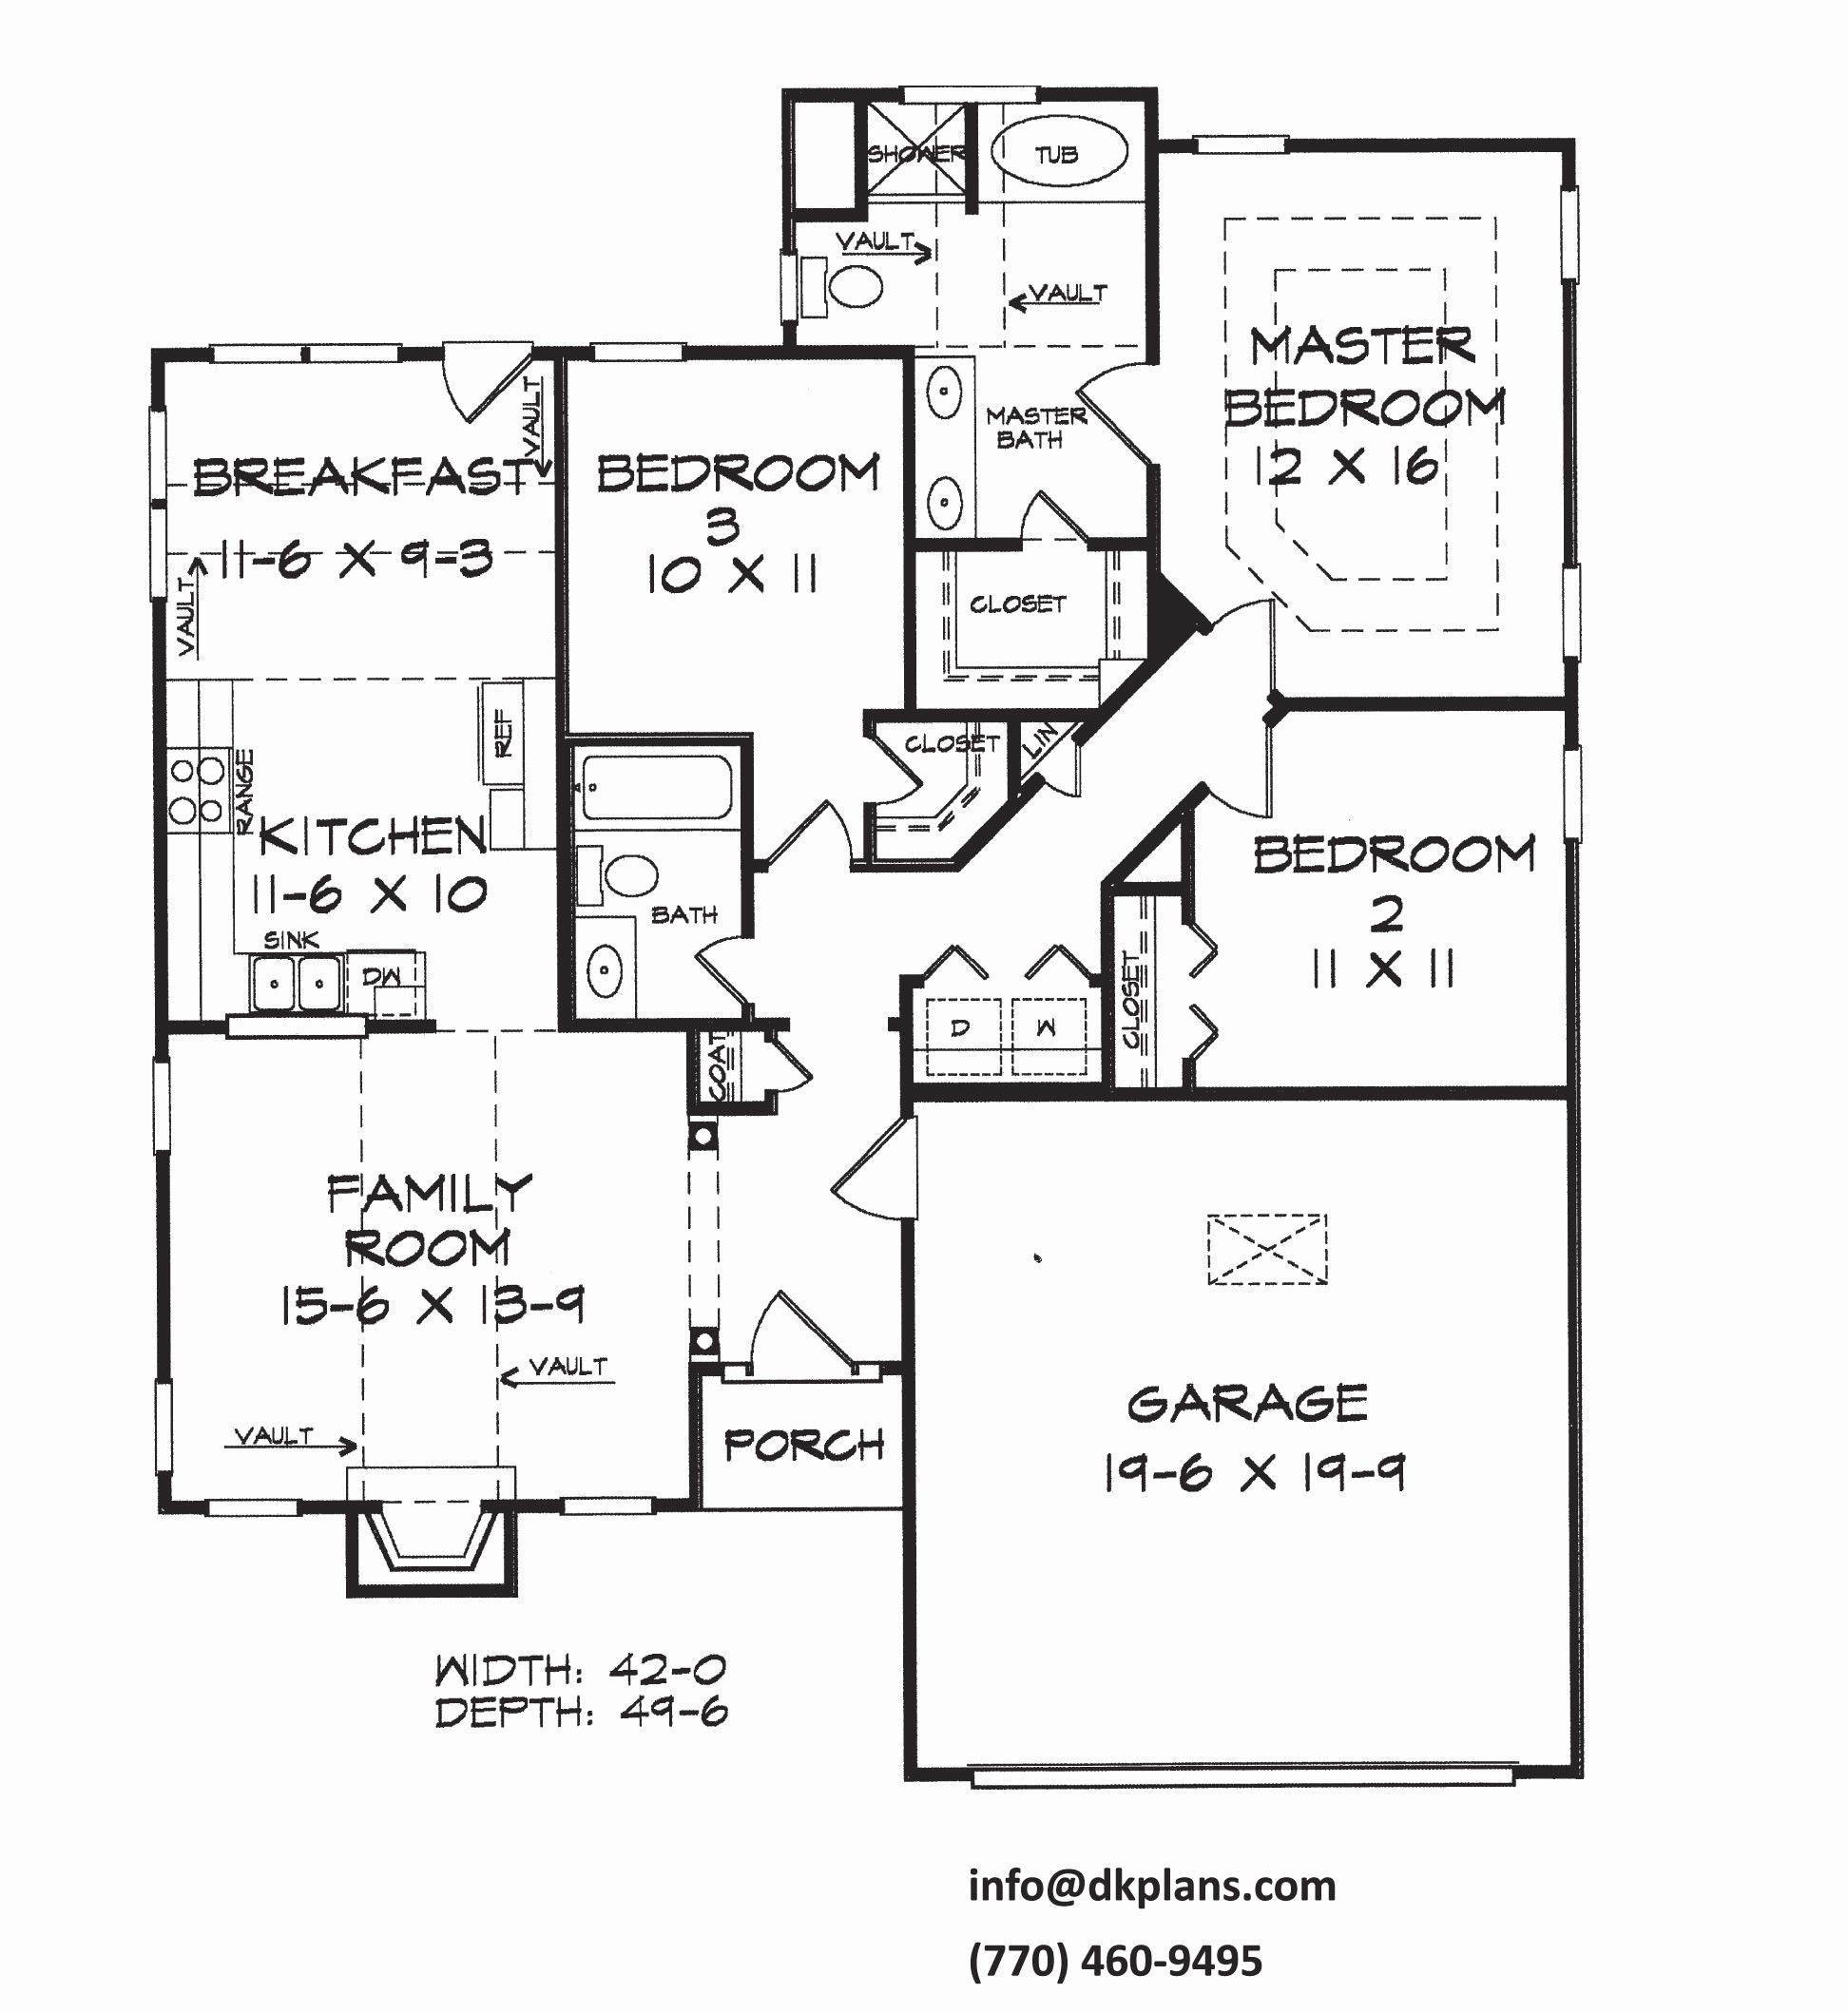 Draw House Plans Online Elegant Draw House Floor Plans Line With Draw House Plans Online Floor Plan Design Master Bedroom Floor Plan Ideas Free House Plans